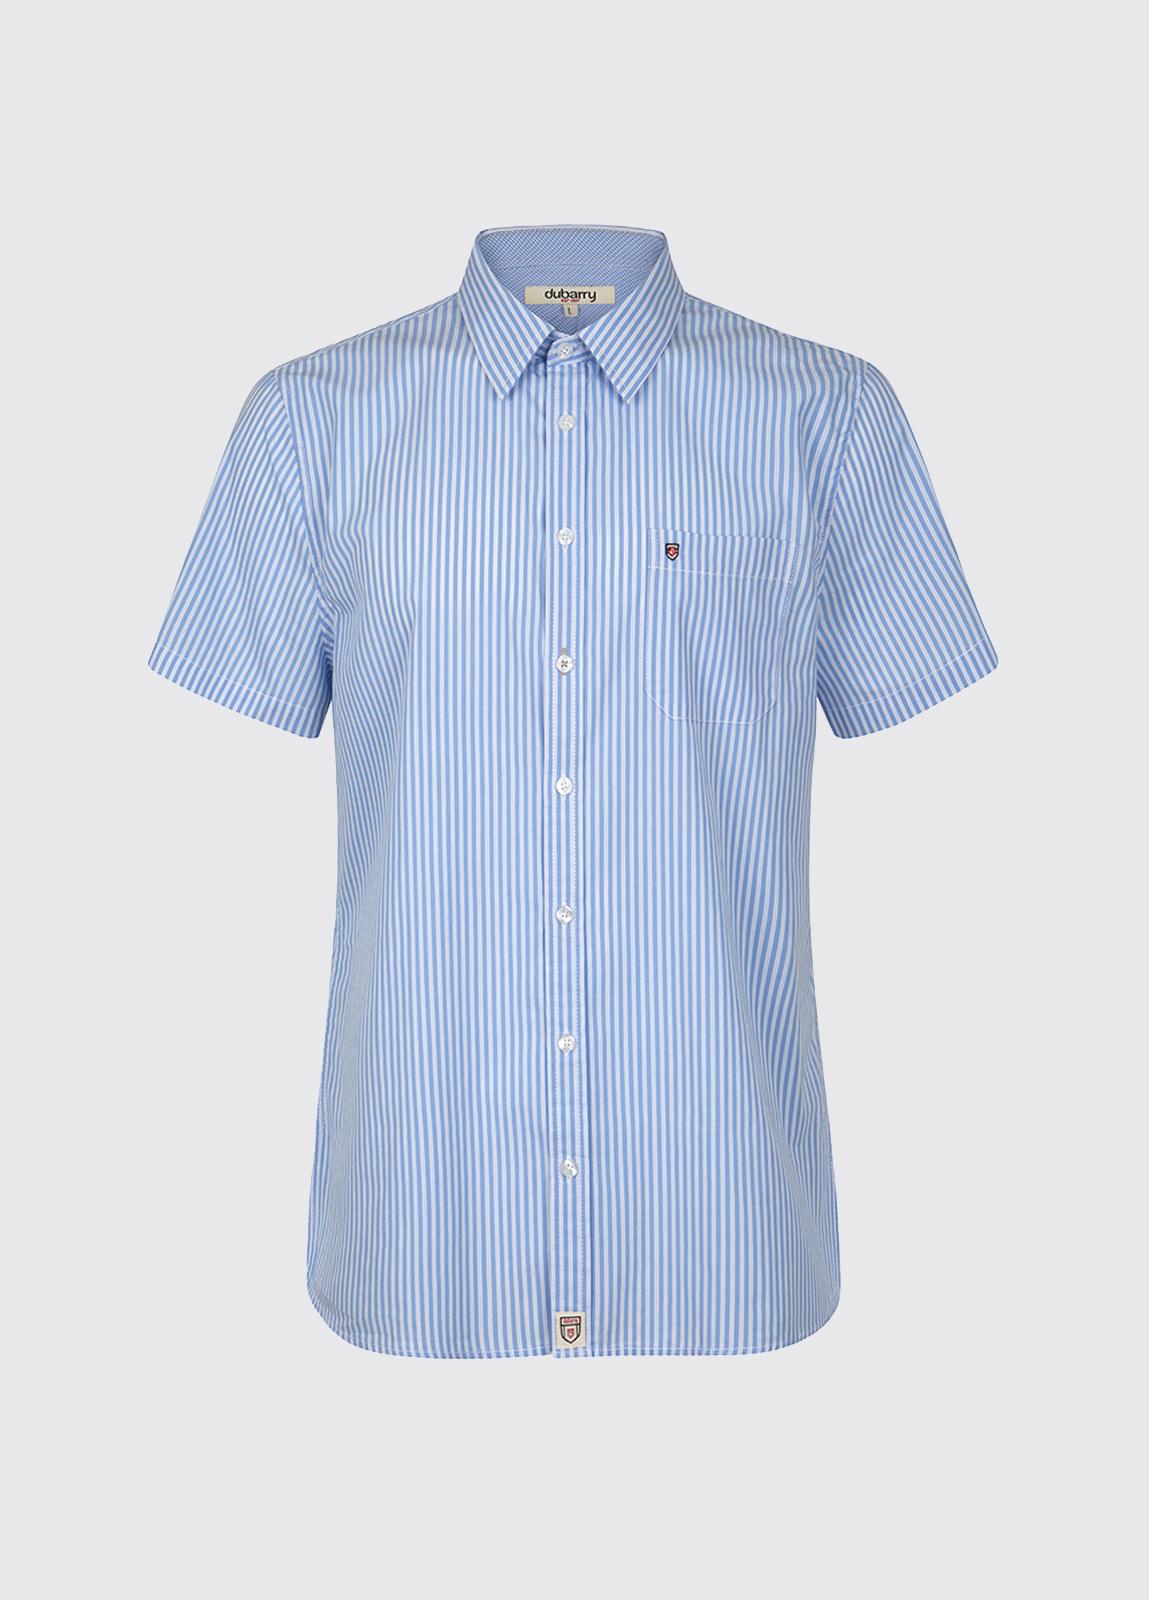 Blackrock Short-Sleeved Striped Shirt - Blue Multi